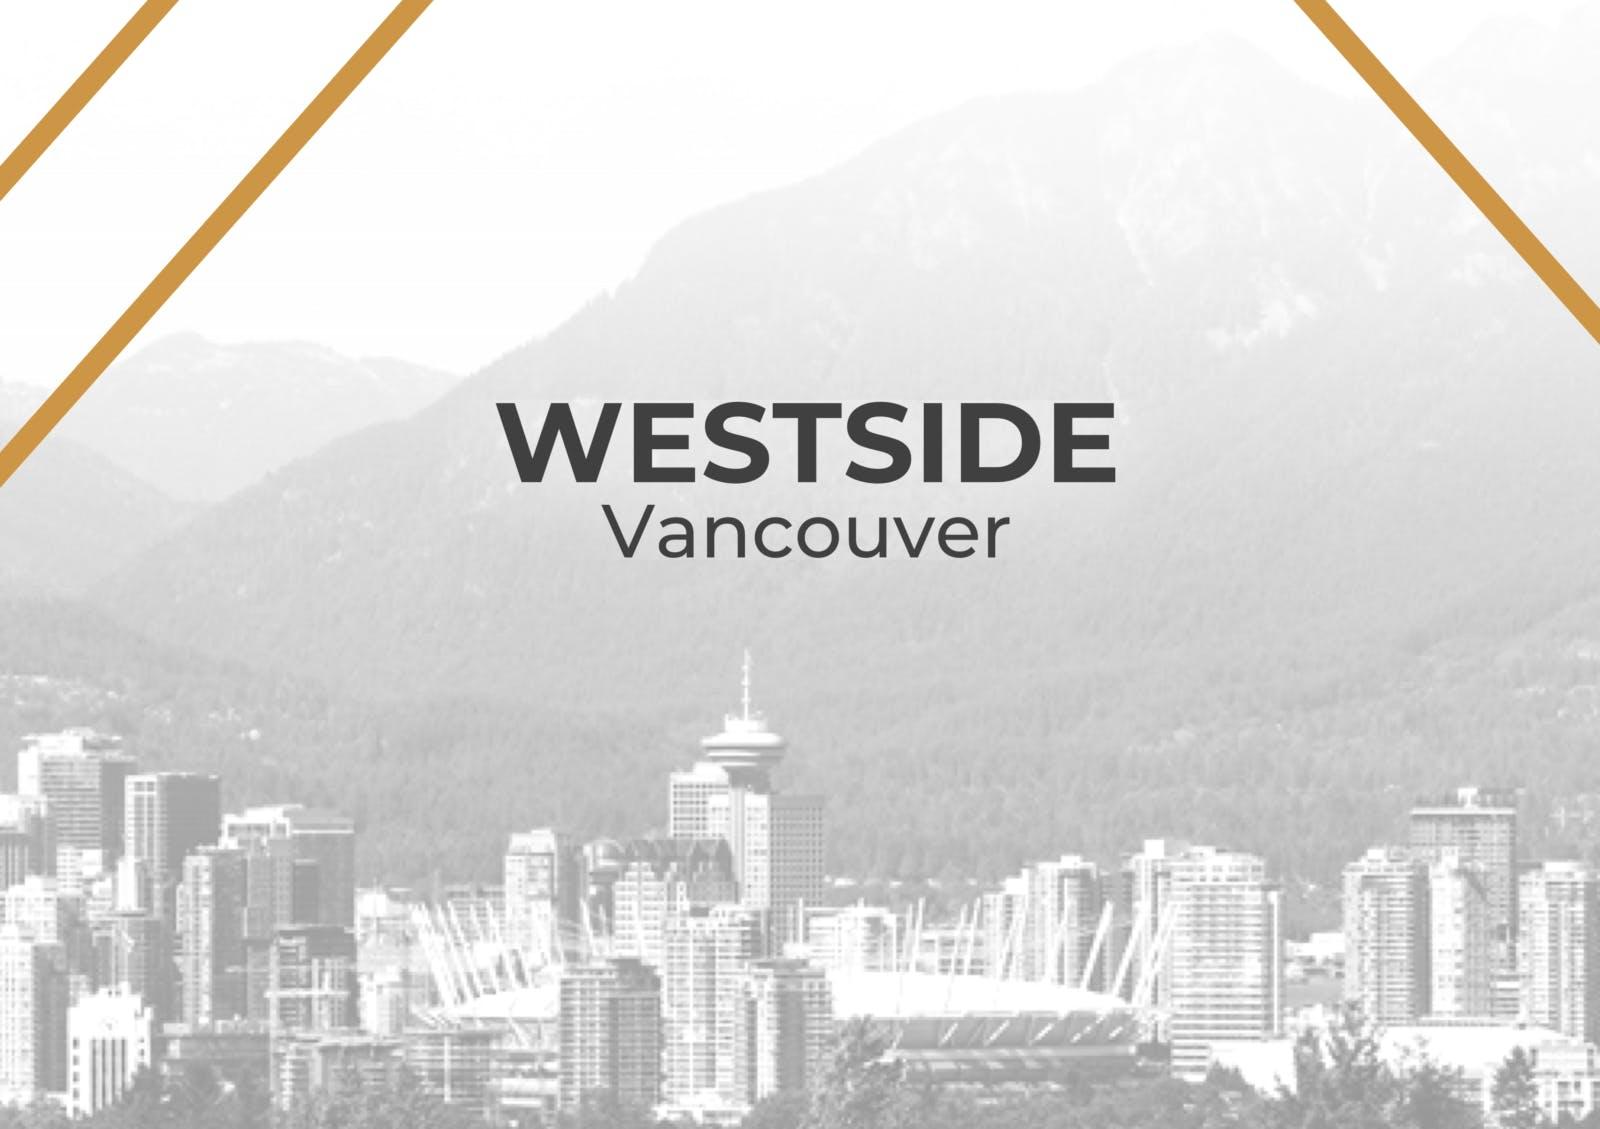 Westside Vancouver